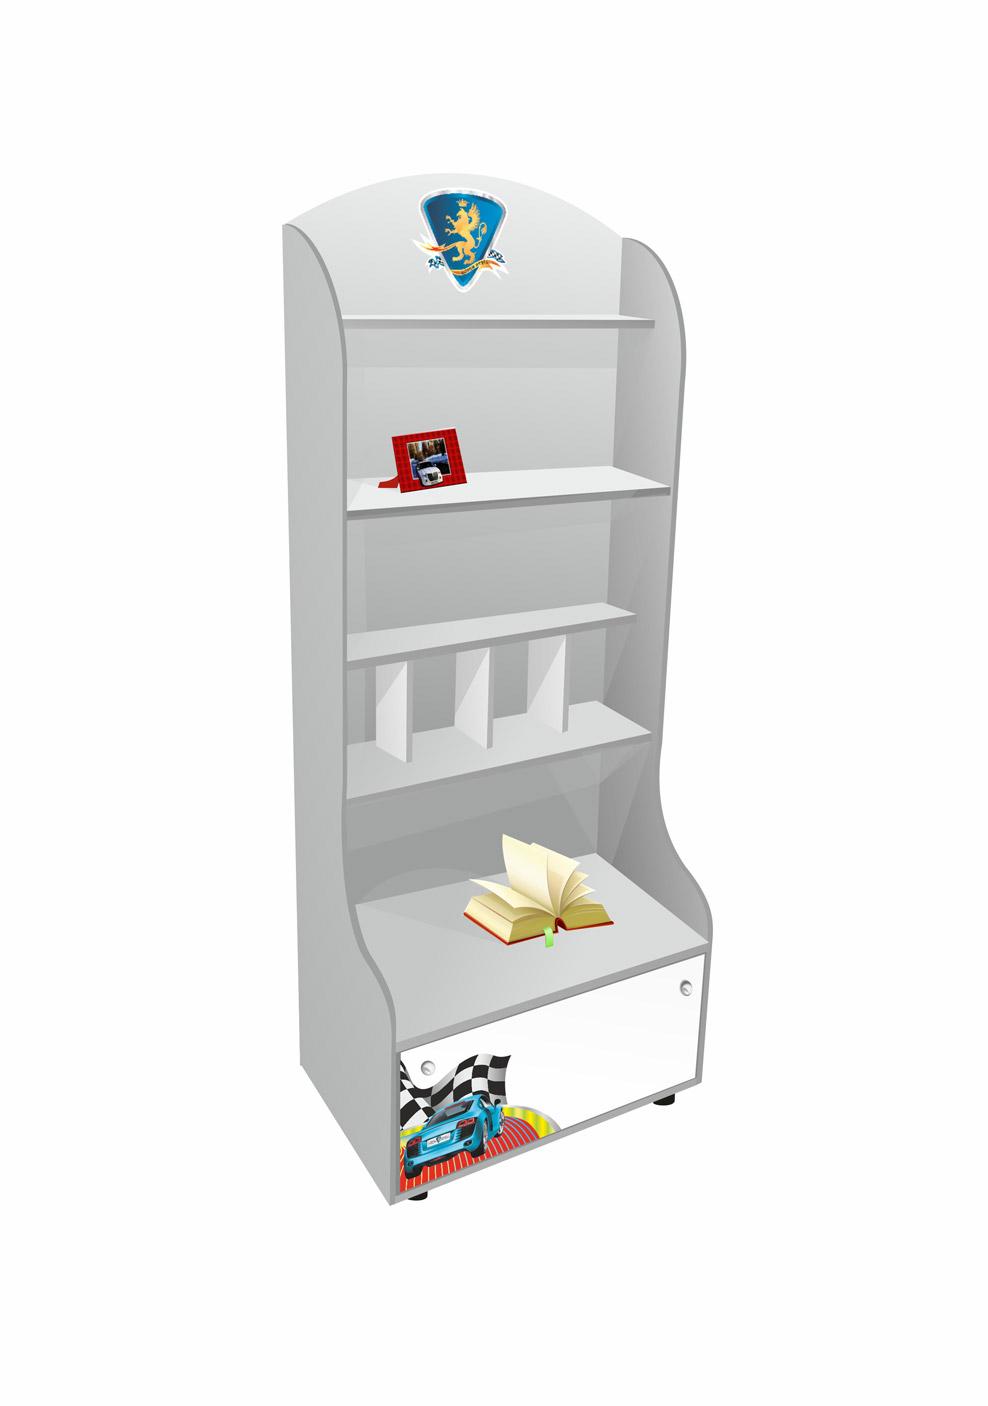 Шкафы и стеллажи Grifon Style R800 Art ЛДСП Silver Metallic